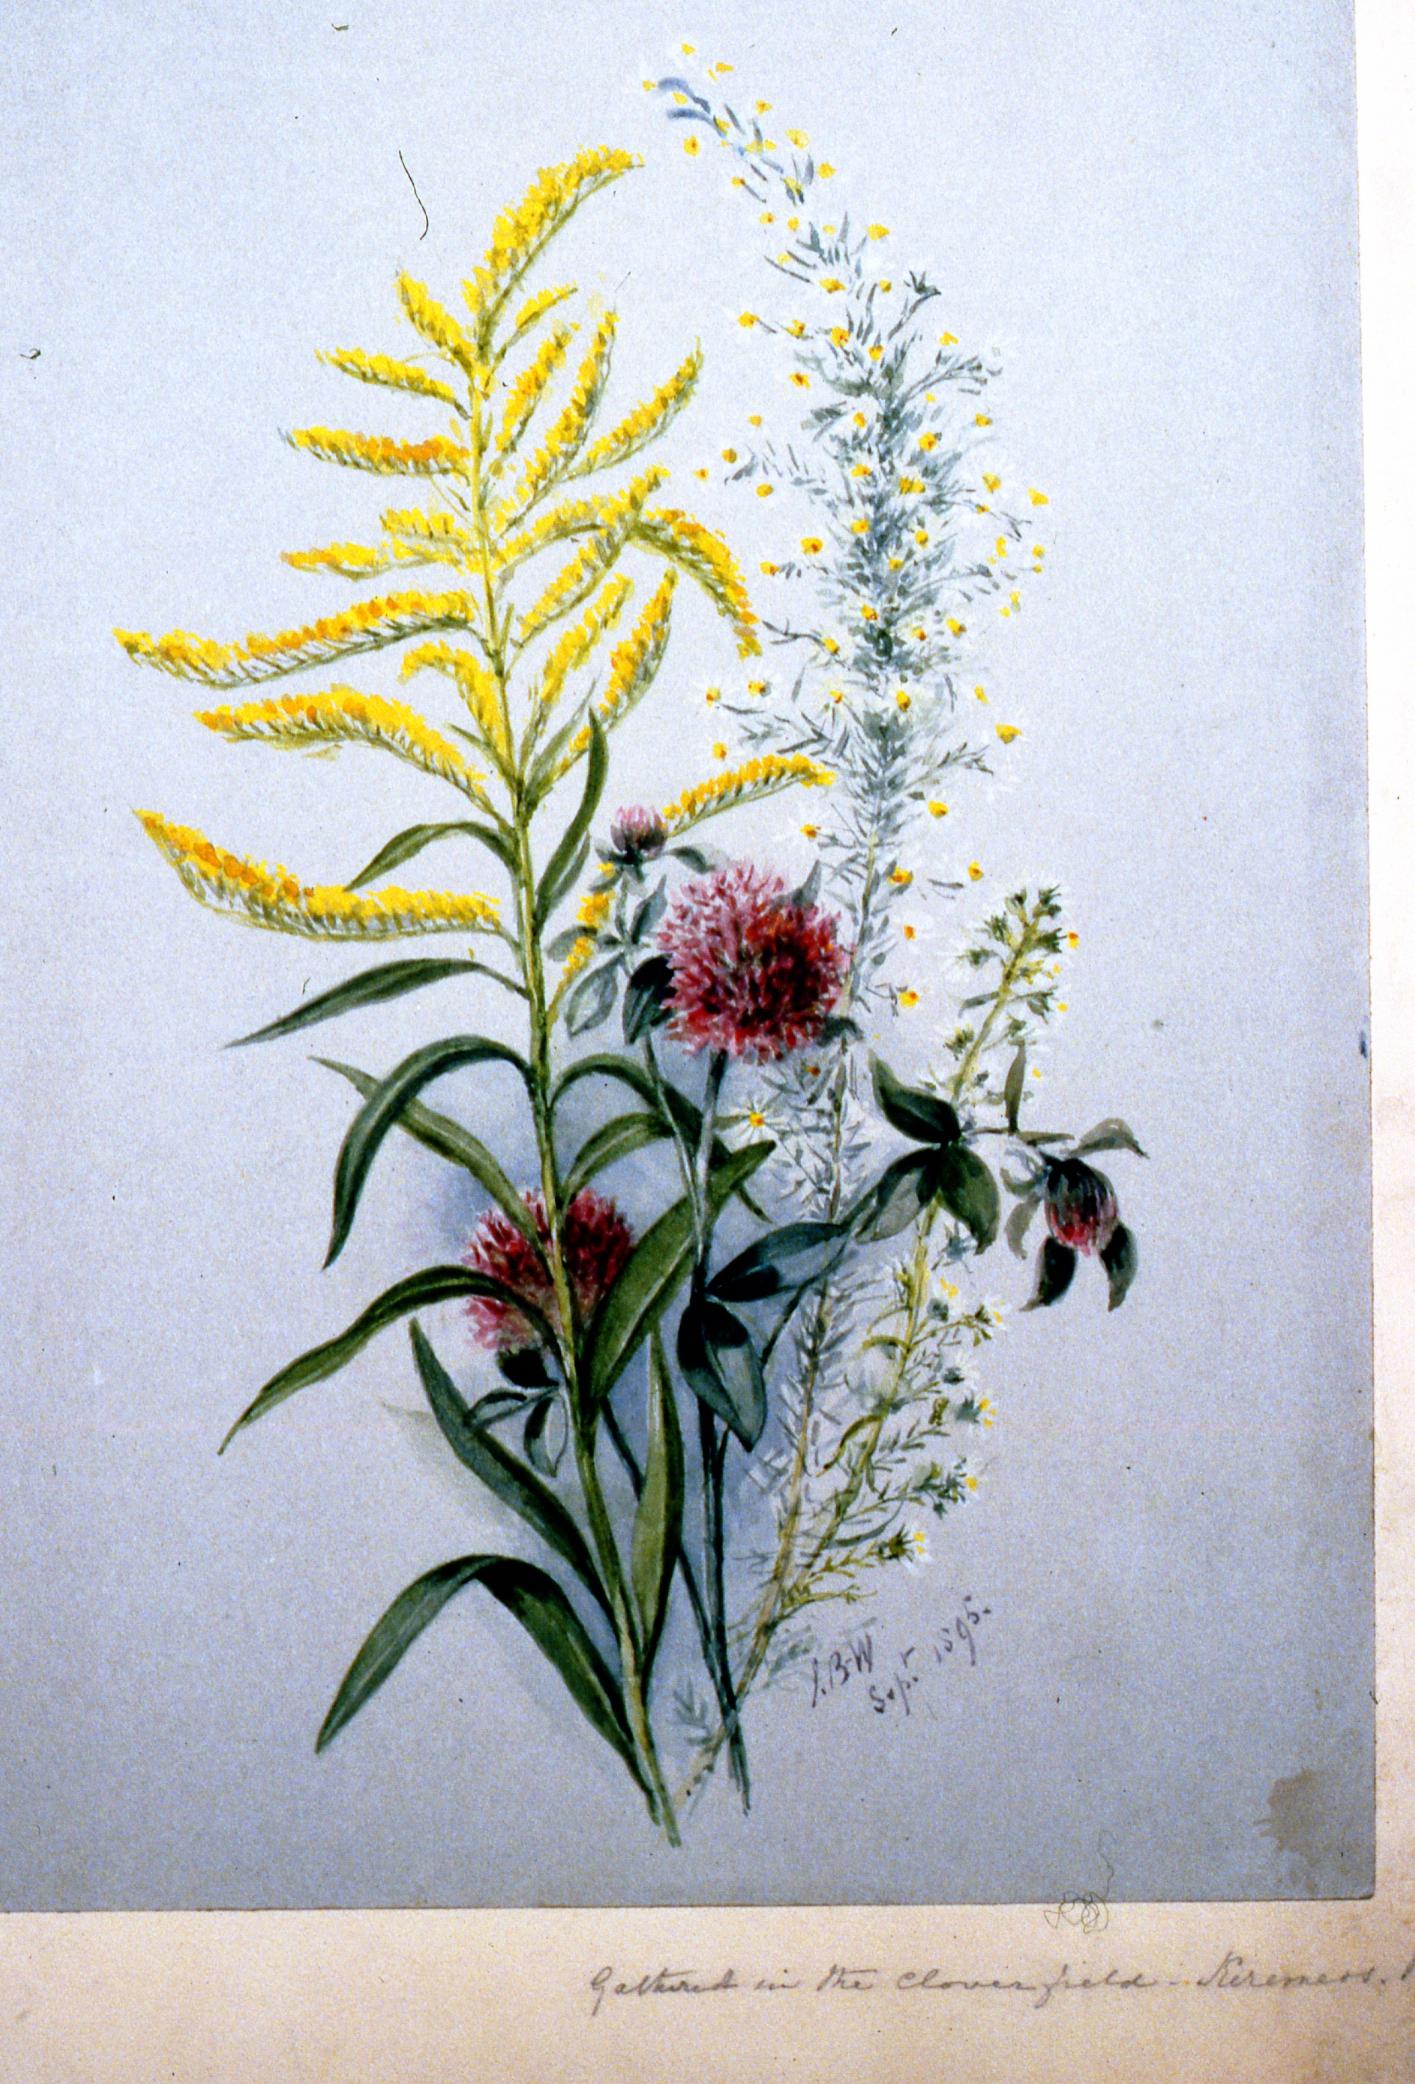 Gathered in Cloverfields , 1895, Julia Bullock Webster, watercolour on paper, 35.5 x 25.5, 1983.02.25. Gift of Mrs. Barbara Steel.